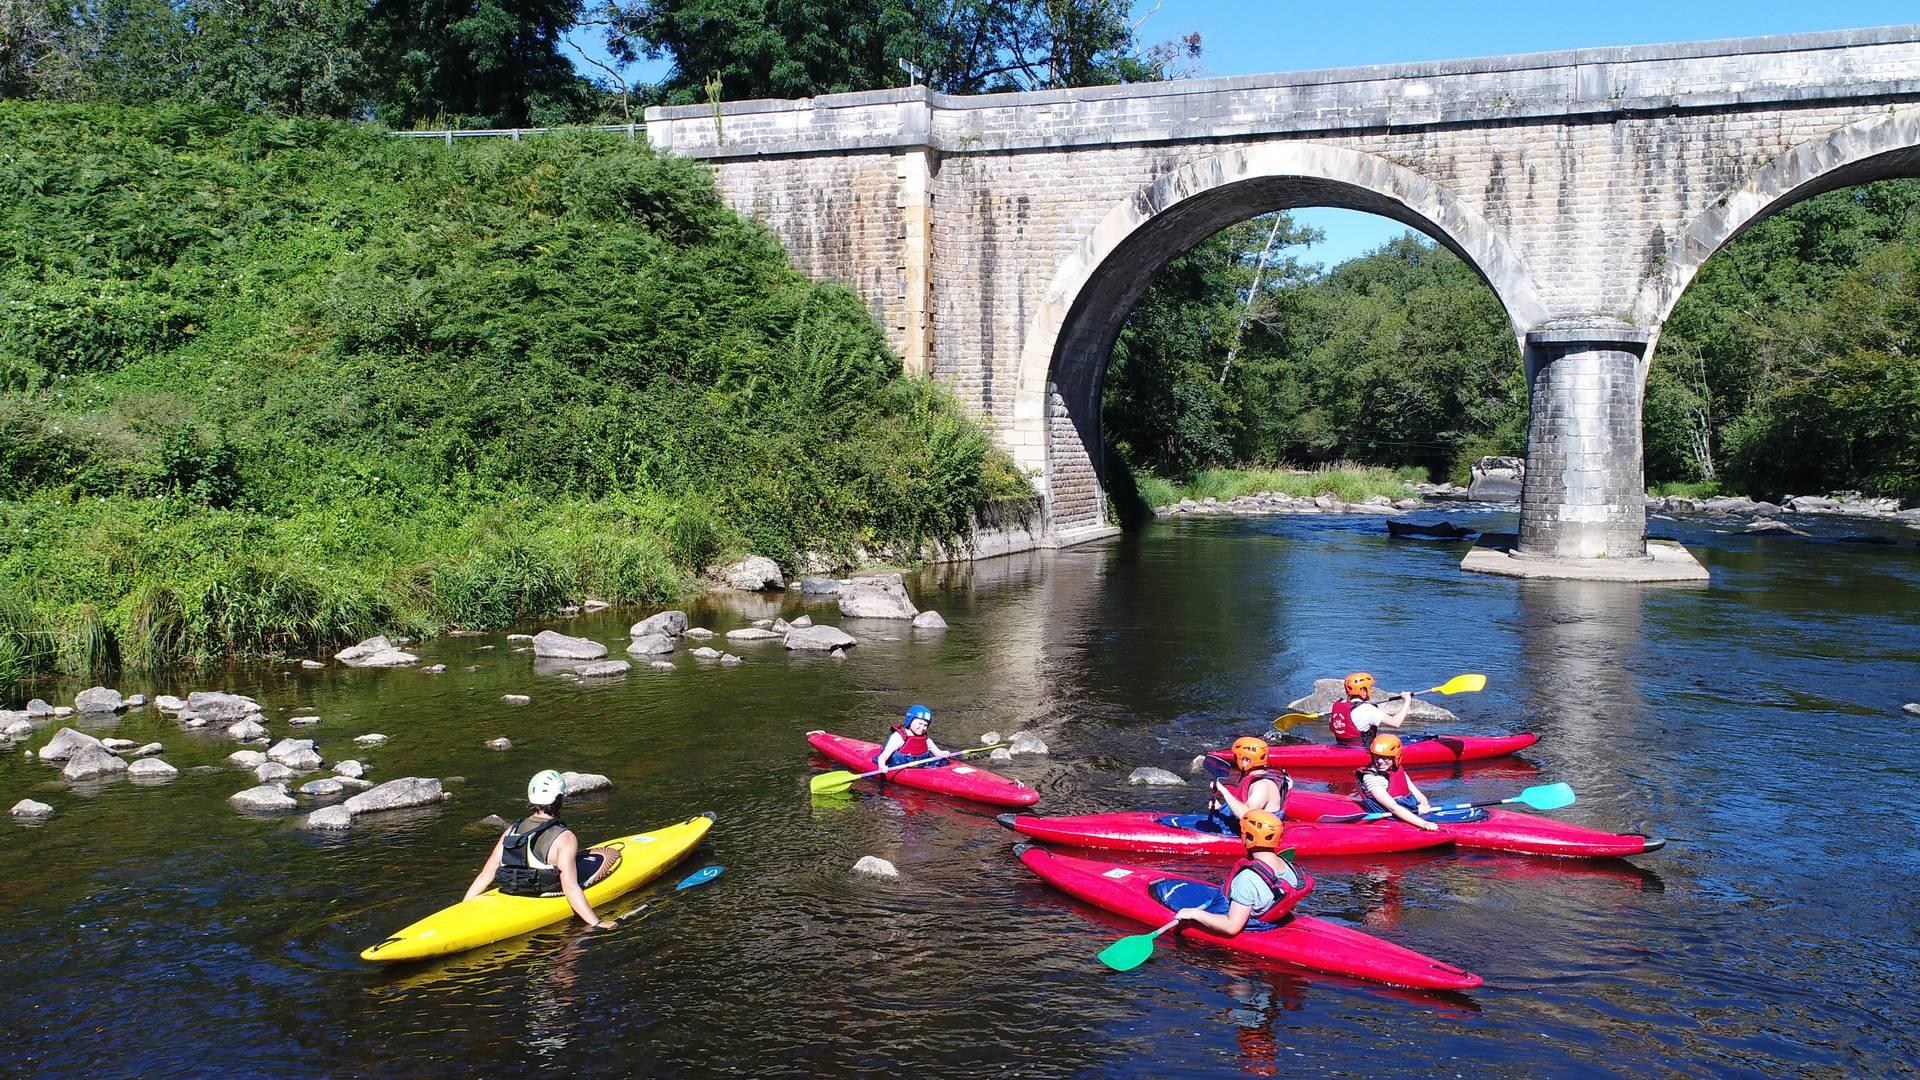 Canoe in Sud-Vienne-Poitou